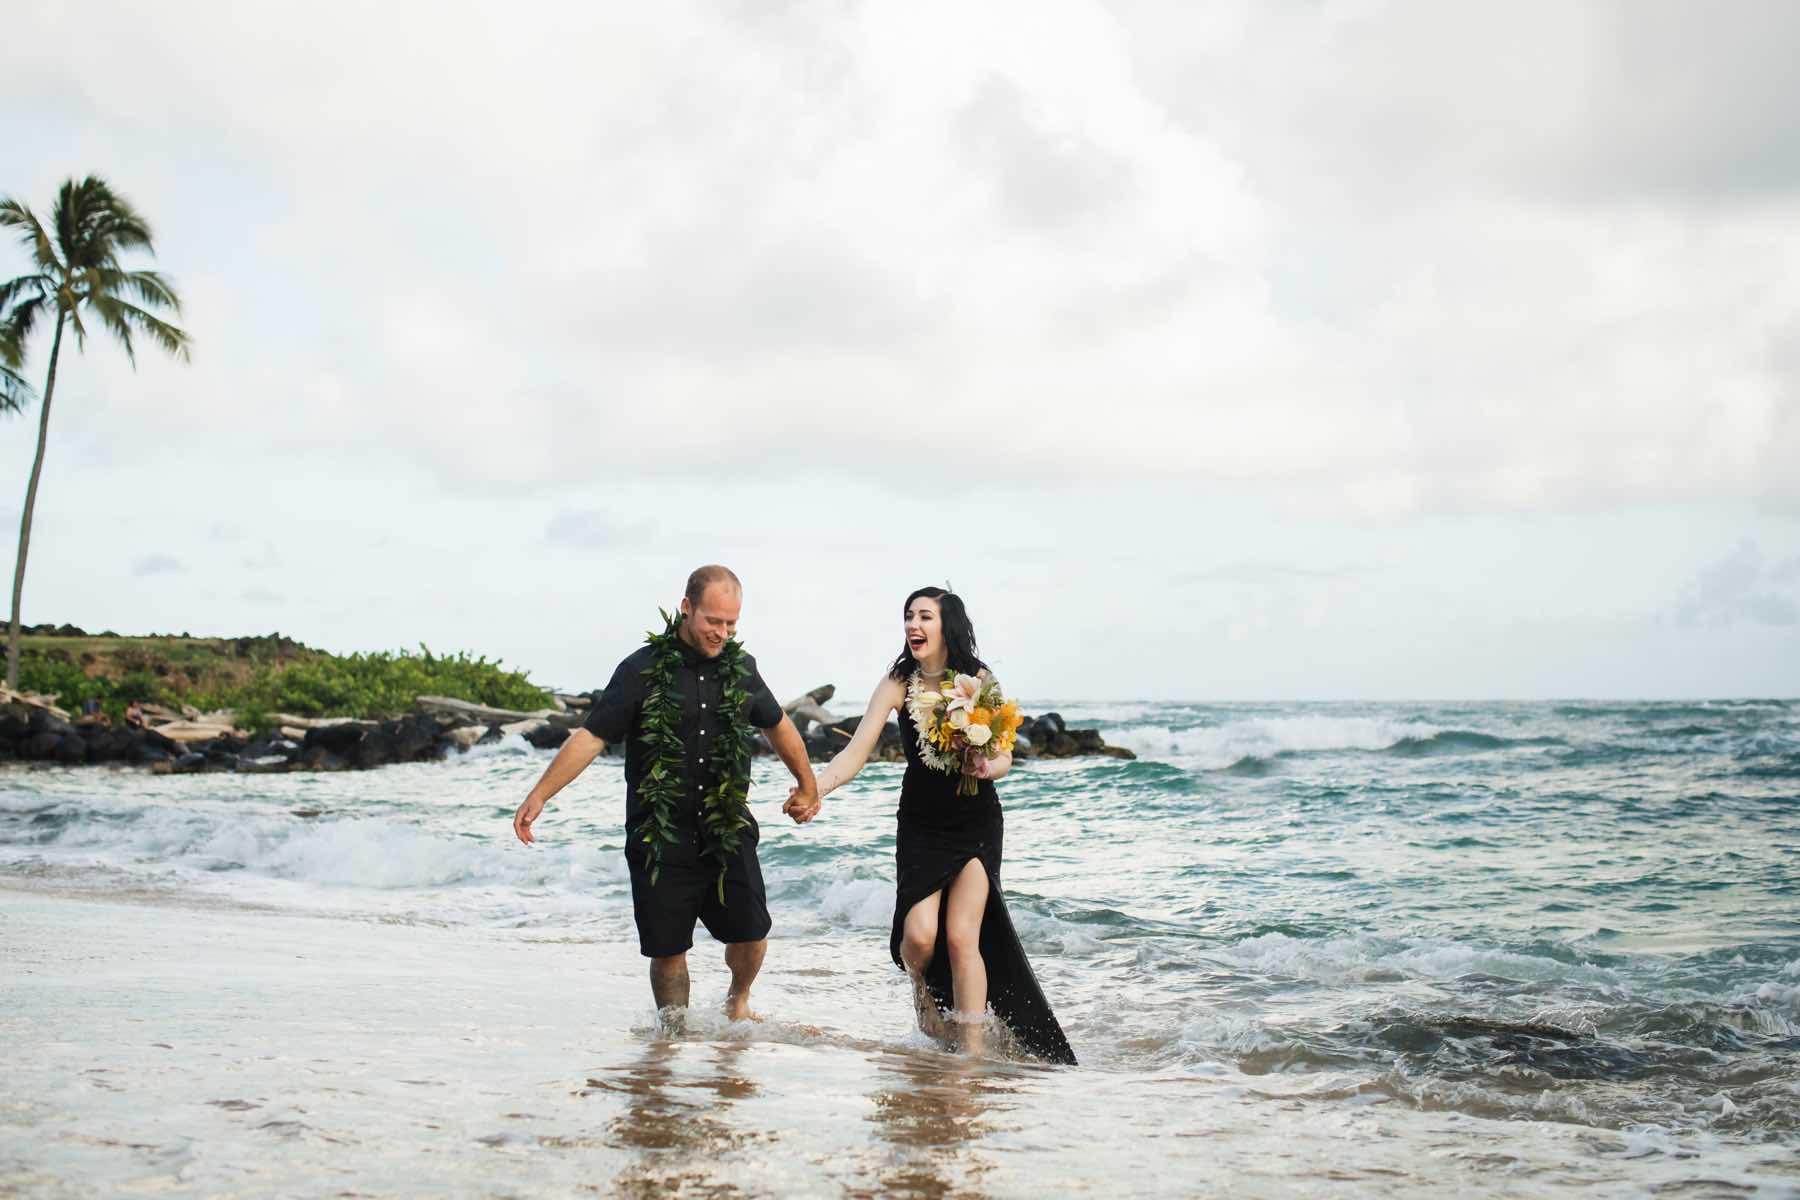 Erin & Matt in the ocean by the beach.